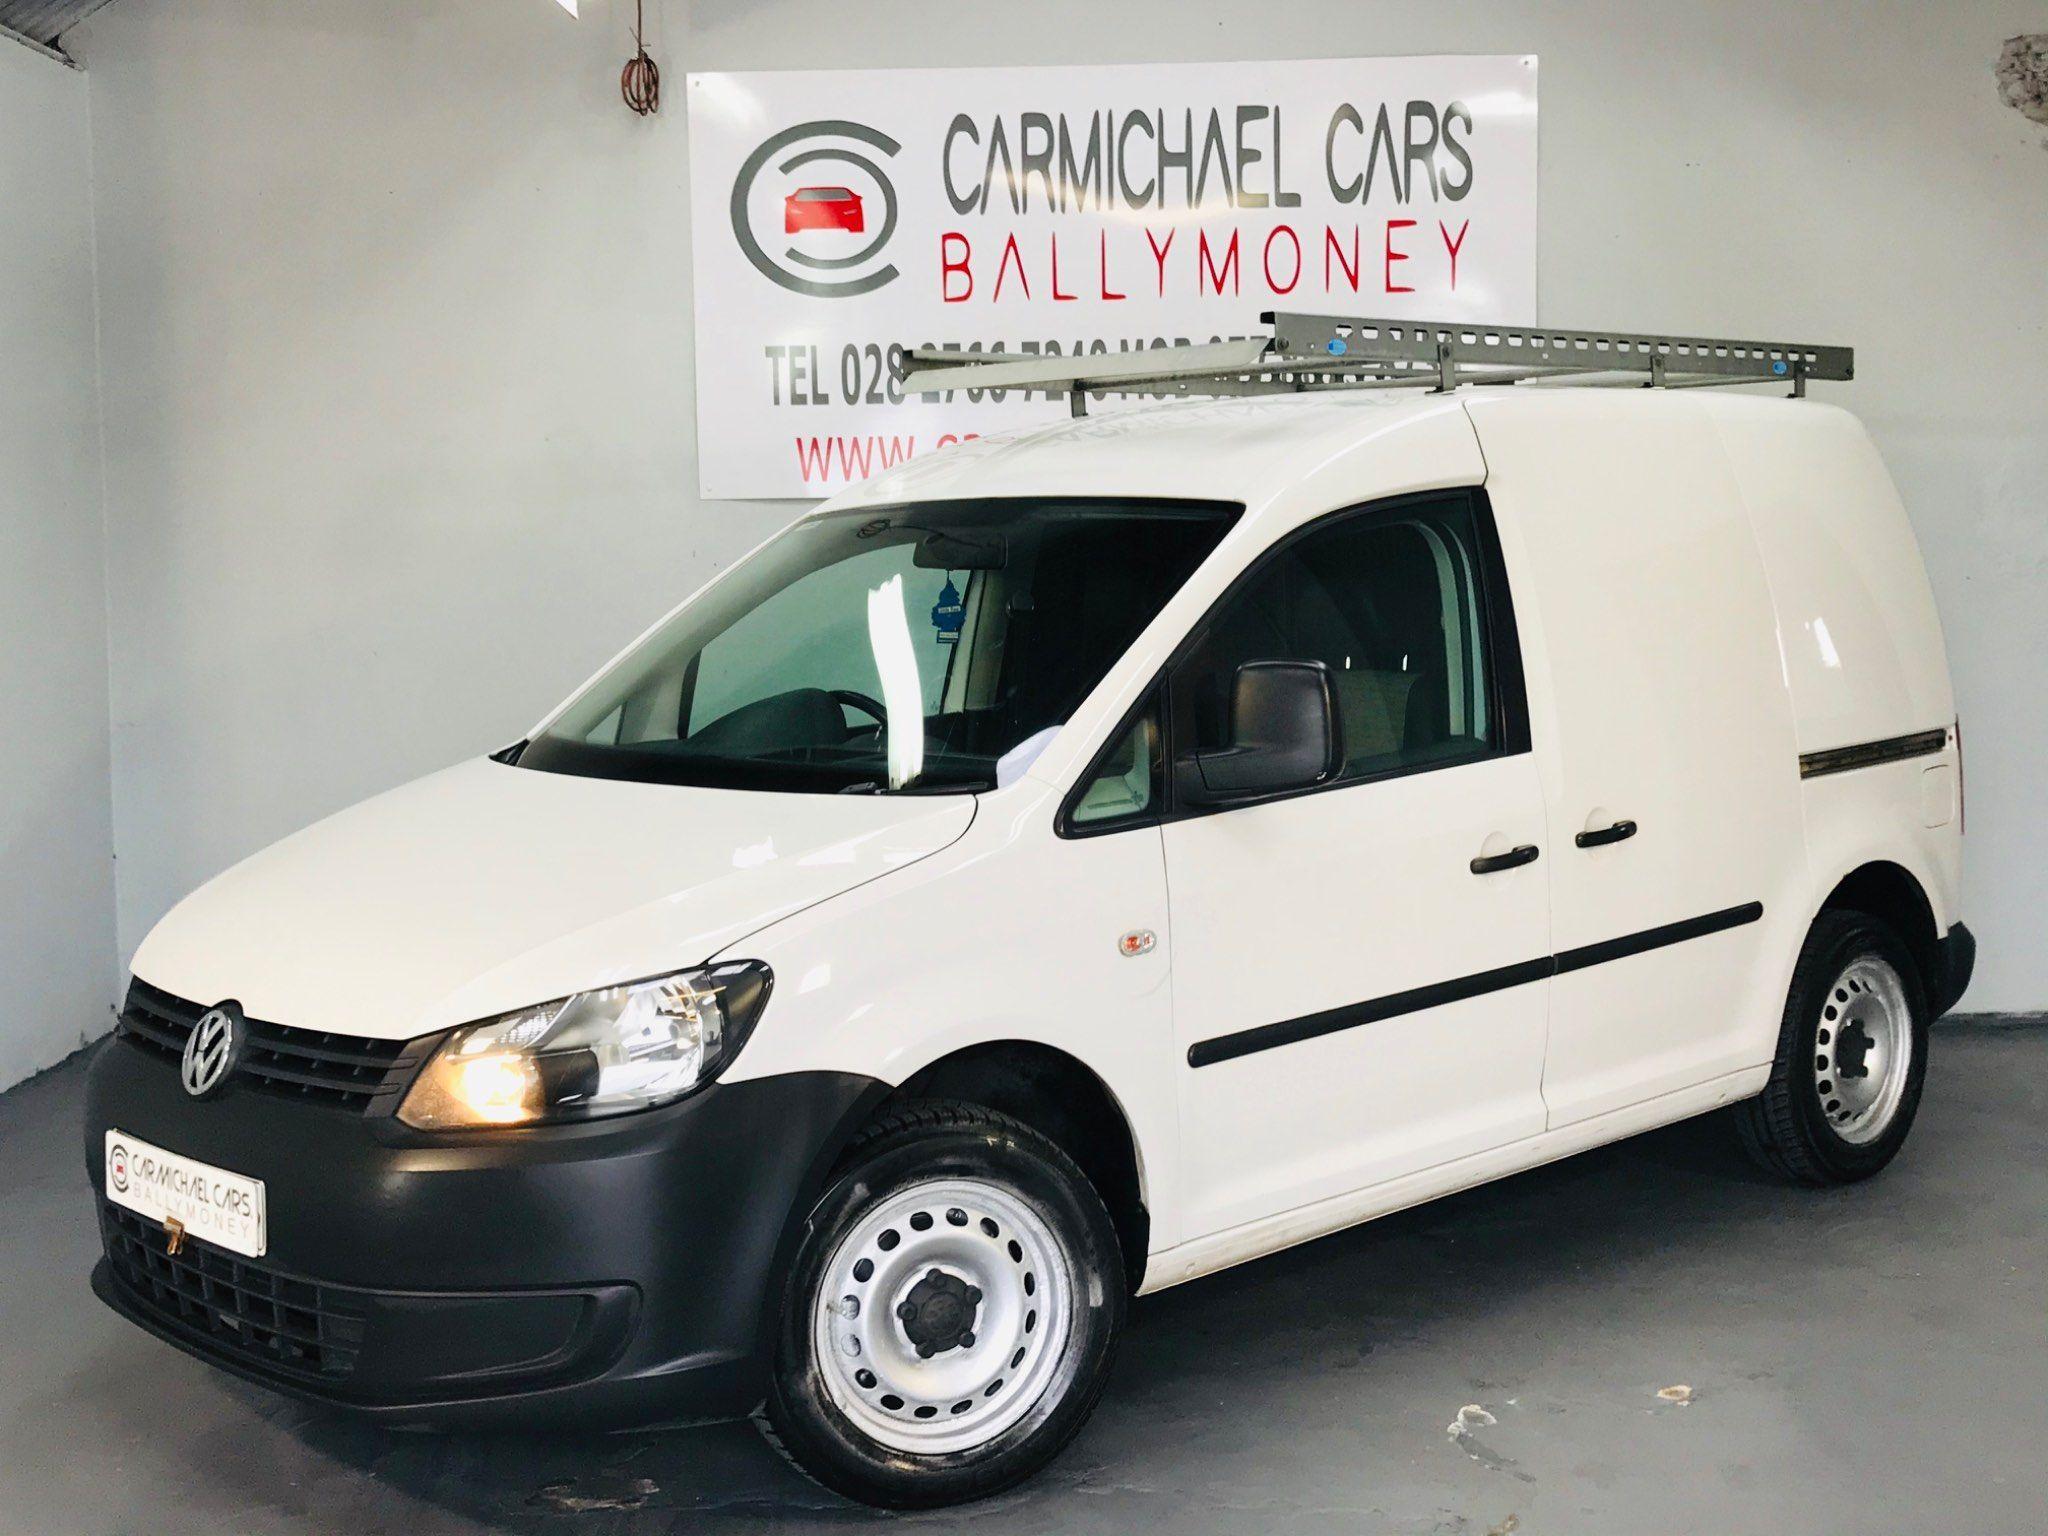 2011 VOLKSWAGEN Caddy 1.6 TDI C20 Panel Van Diesel  WHITE, 136K, – Carmichael Cars Ballymoney full